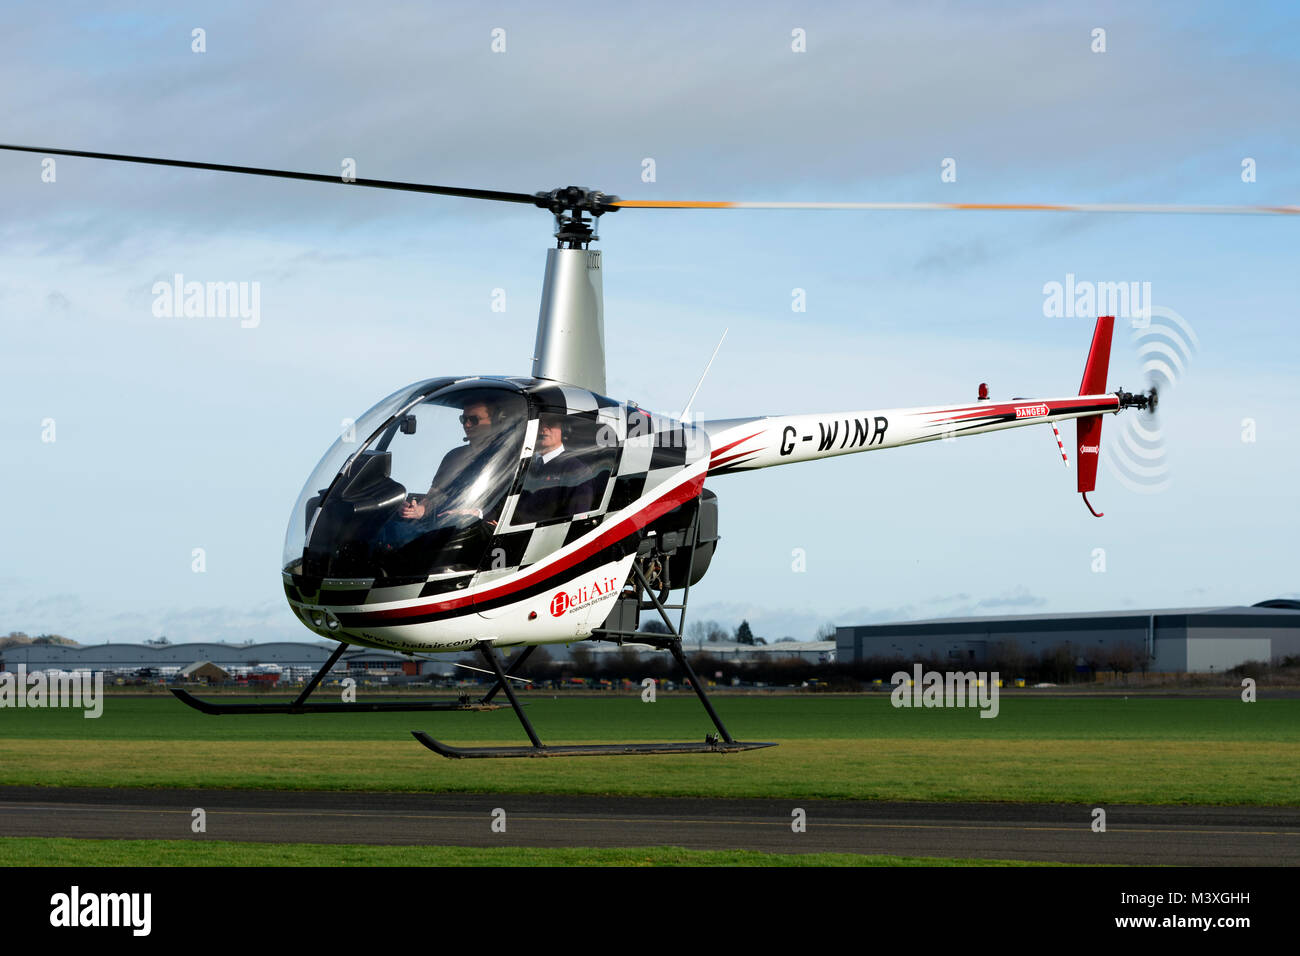 Elicottero R22 : Robinson r beta ii elicottero a wellesbourne airfield